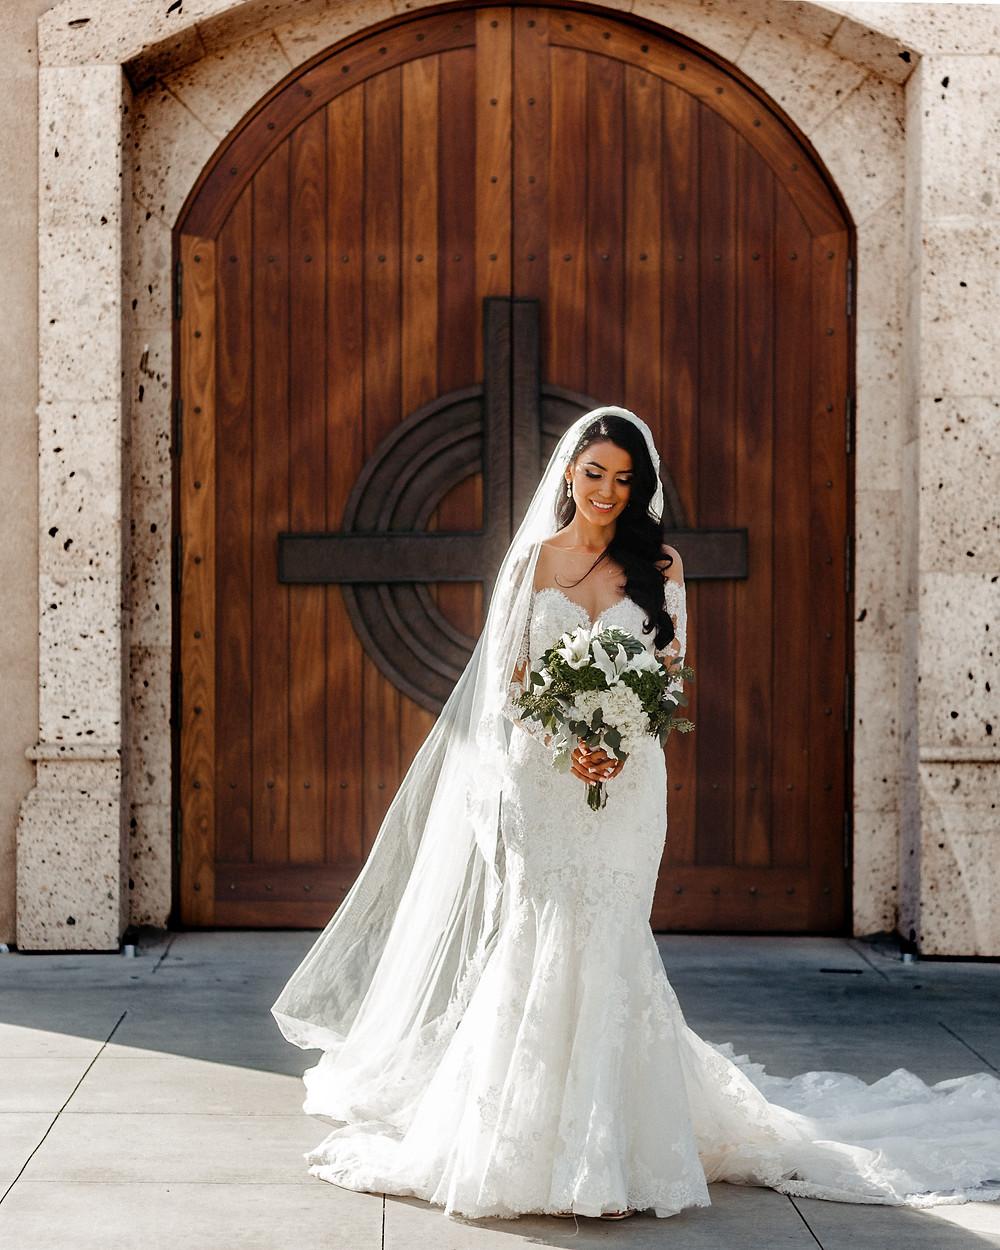 Bride holding a bouquet outside a church